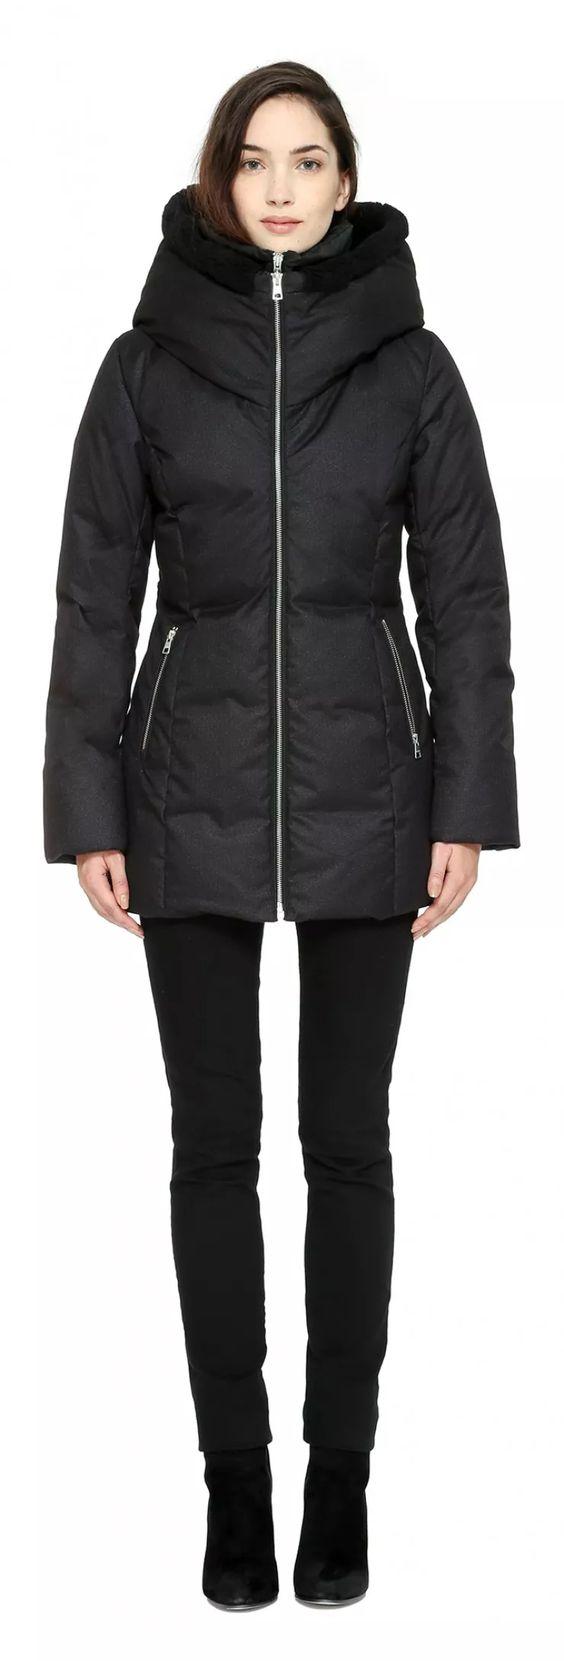 PEARLIE Car coat length brushed down coat in Black | Manteaux